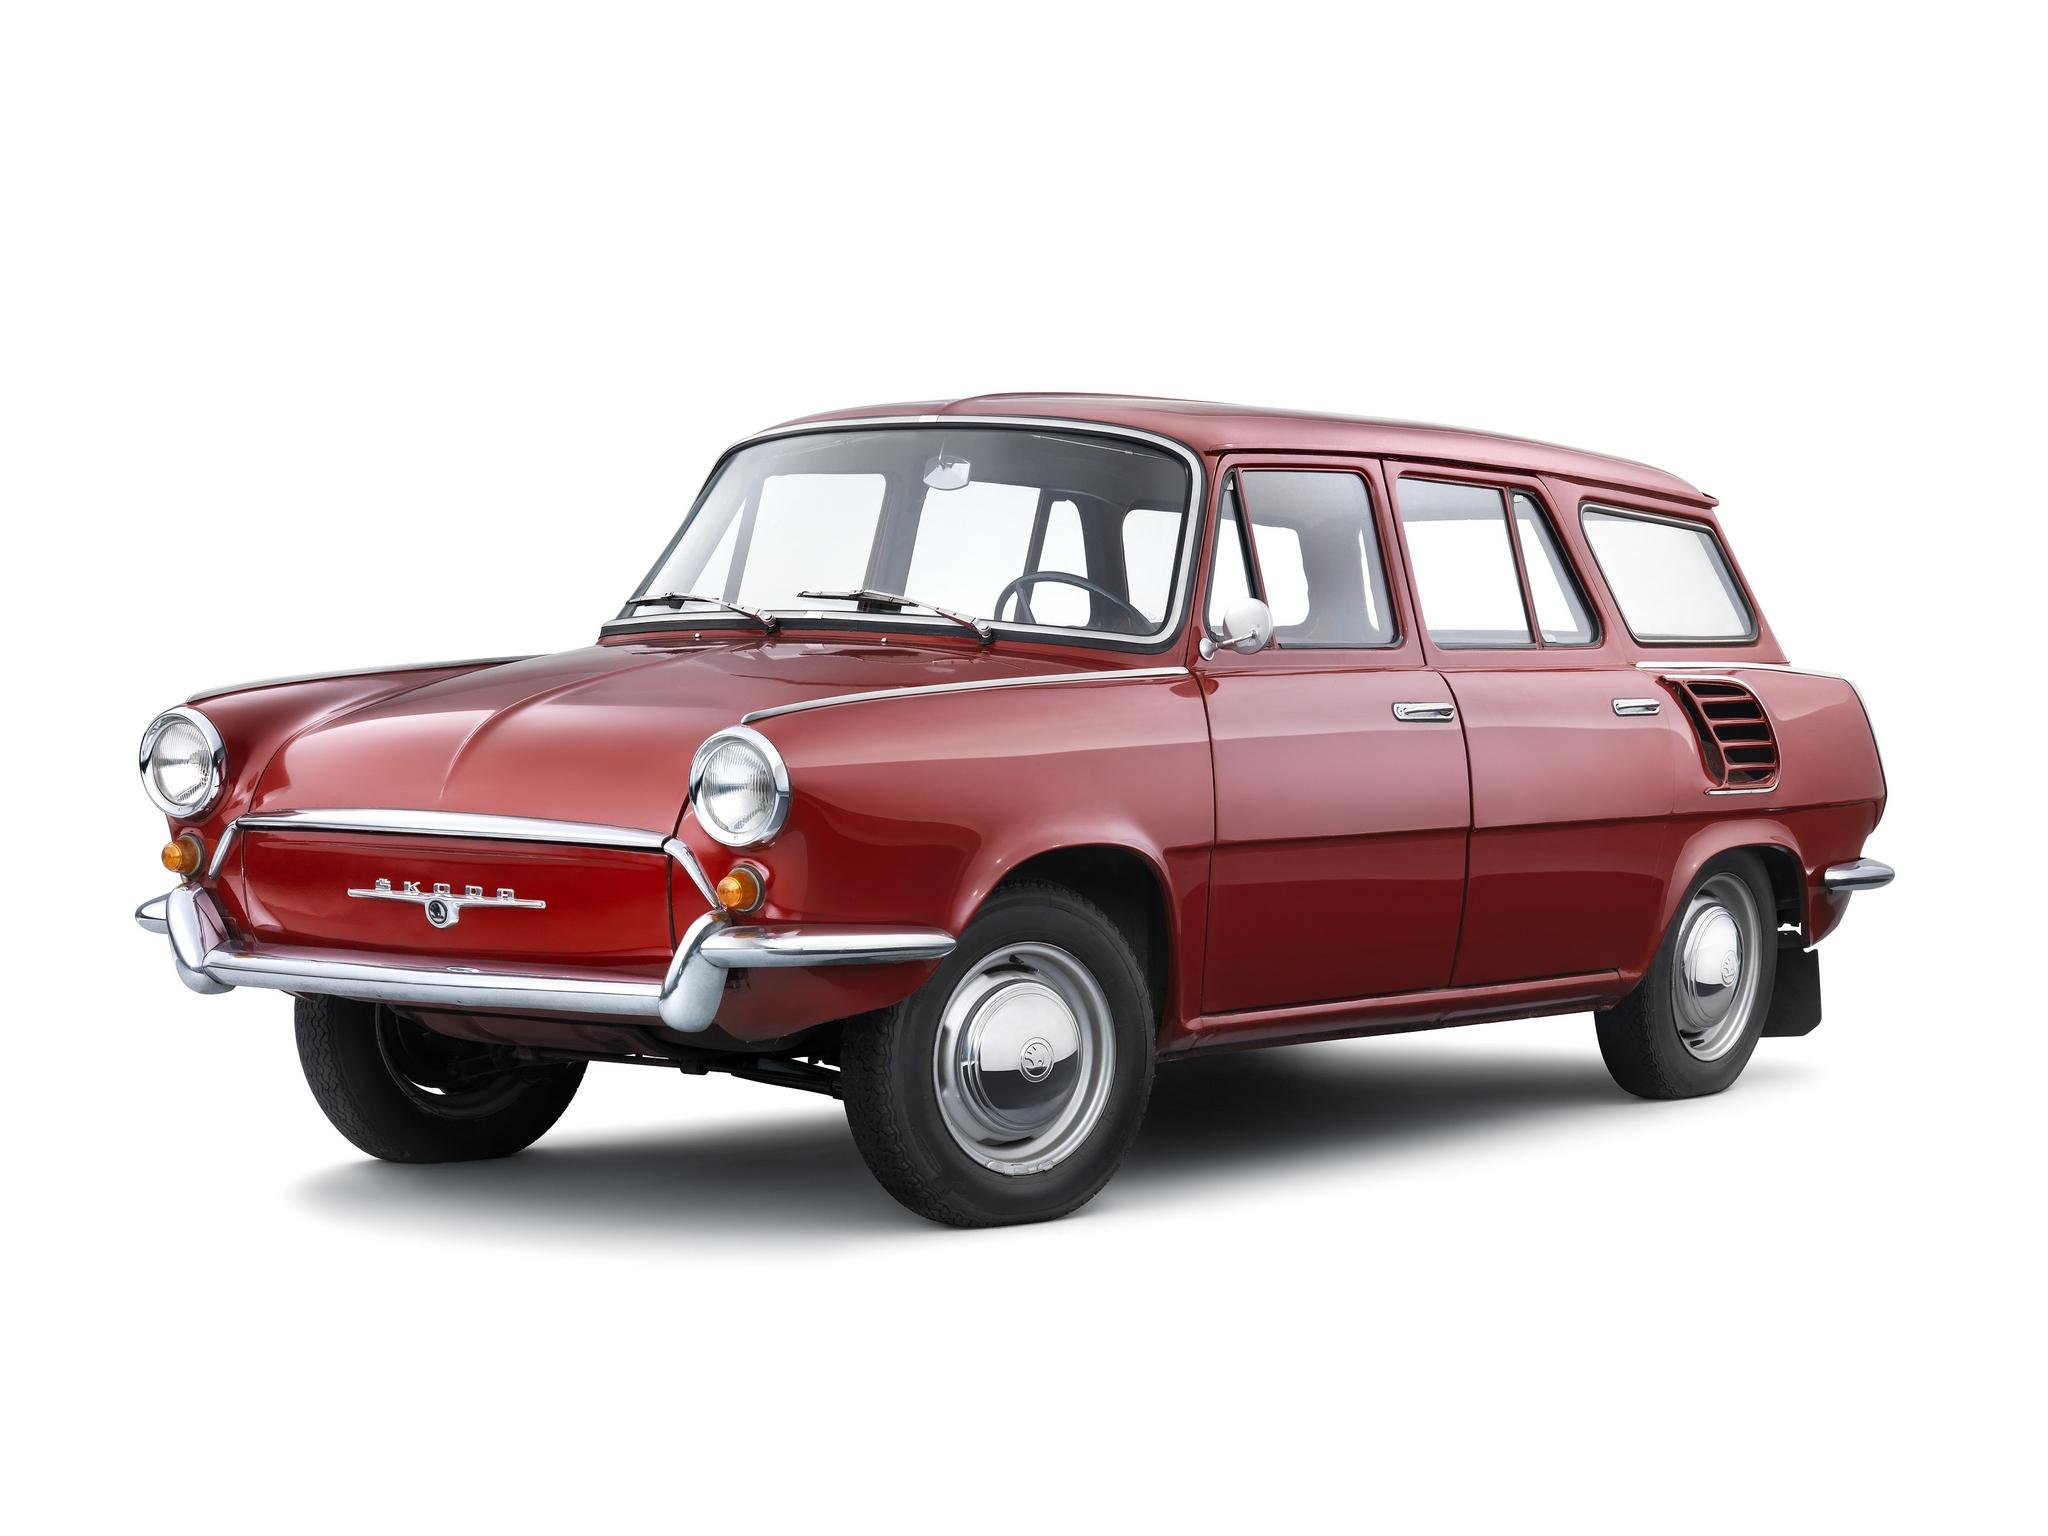 1963 skoda 1000 mb kombi prototype 990 stationwagon. Black Bedroom Furniture Sets. Home Design Ideas